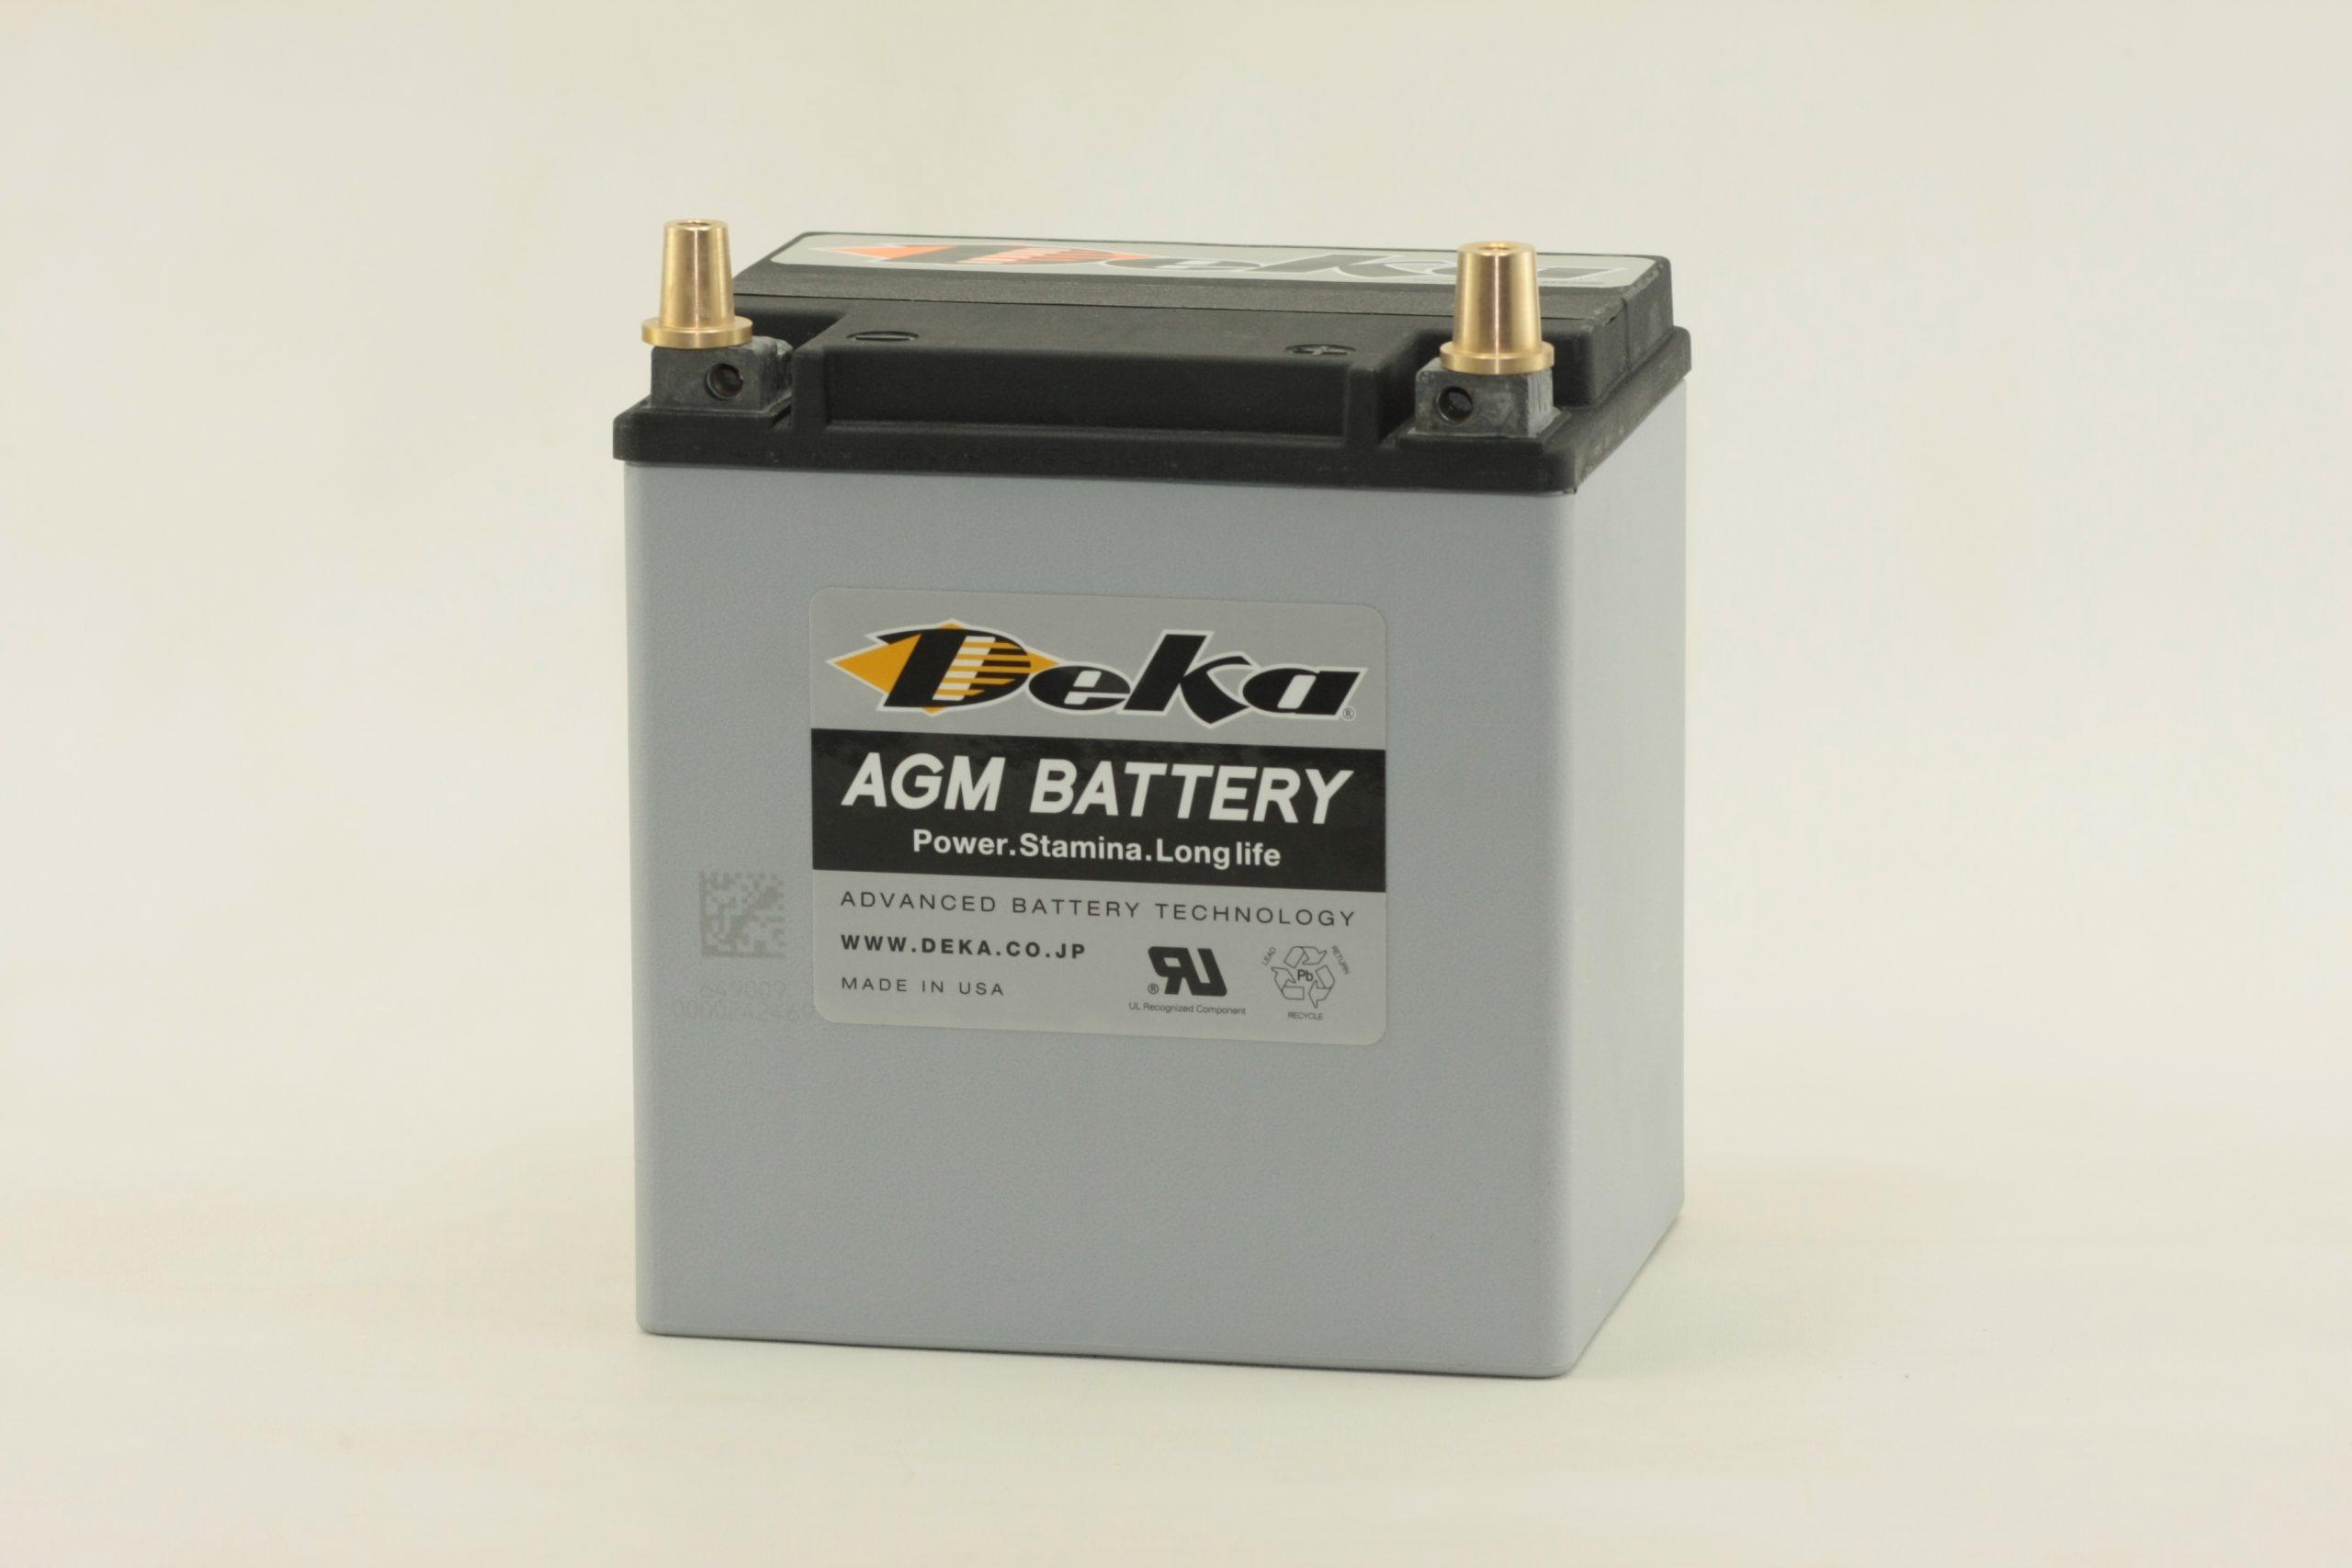 『Deka』のBNR34/R35向けの高性能AGMバッテリーETX-30Lとポルシェのスポーツ走行向け軽量バッテリー9A47